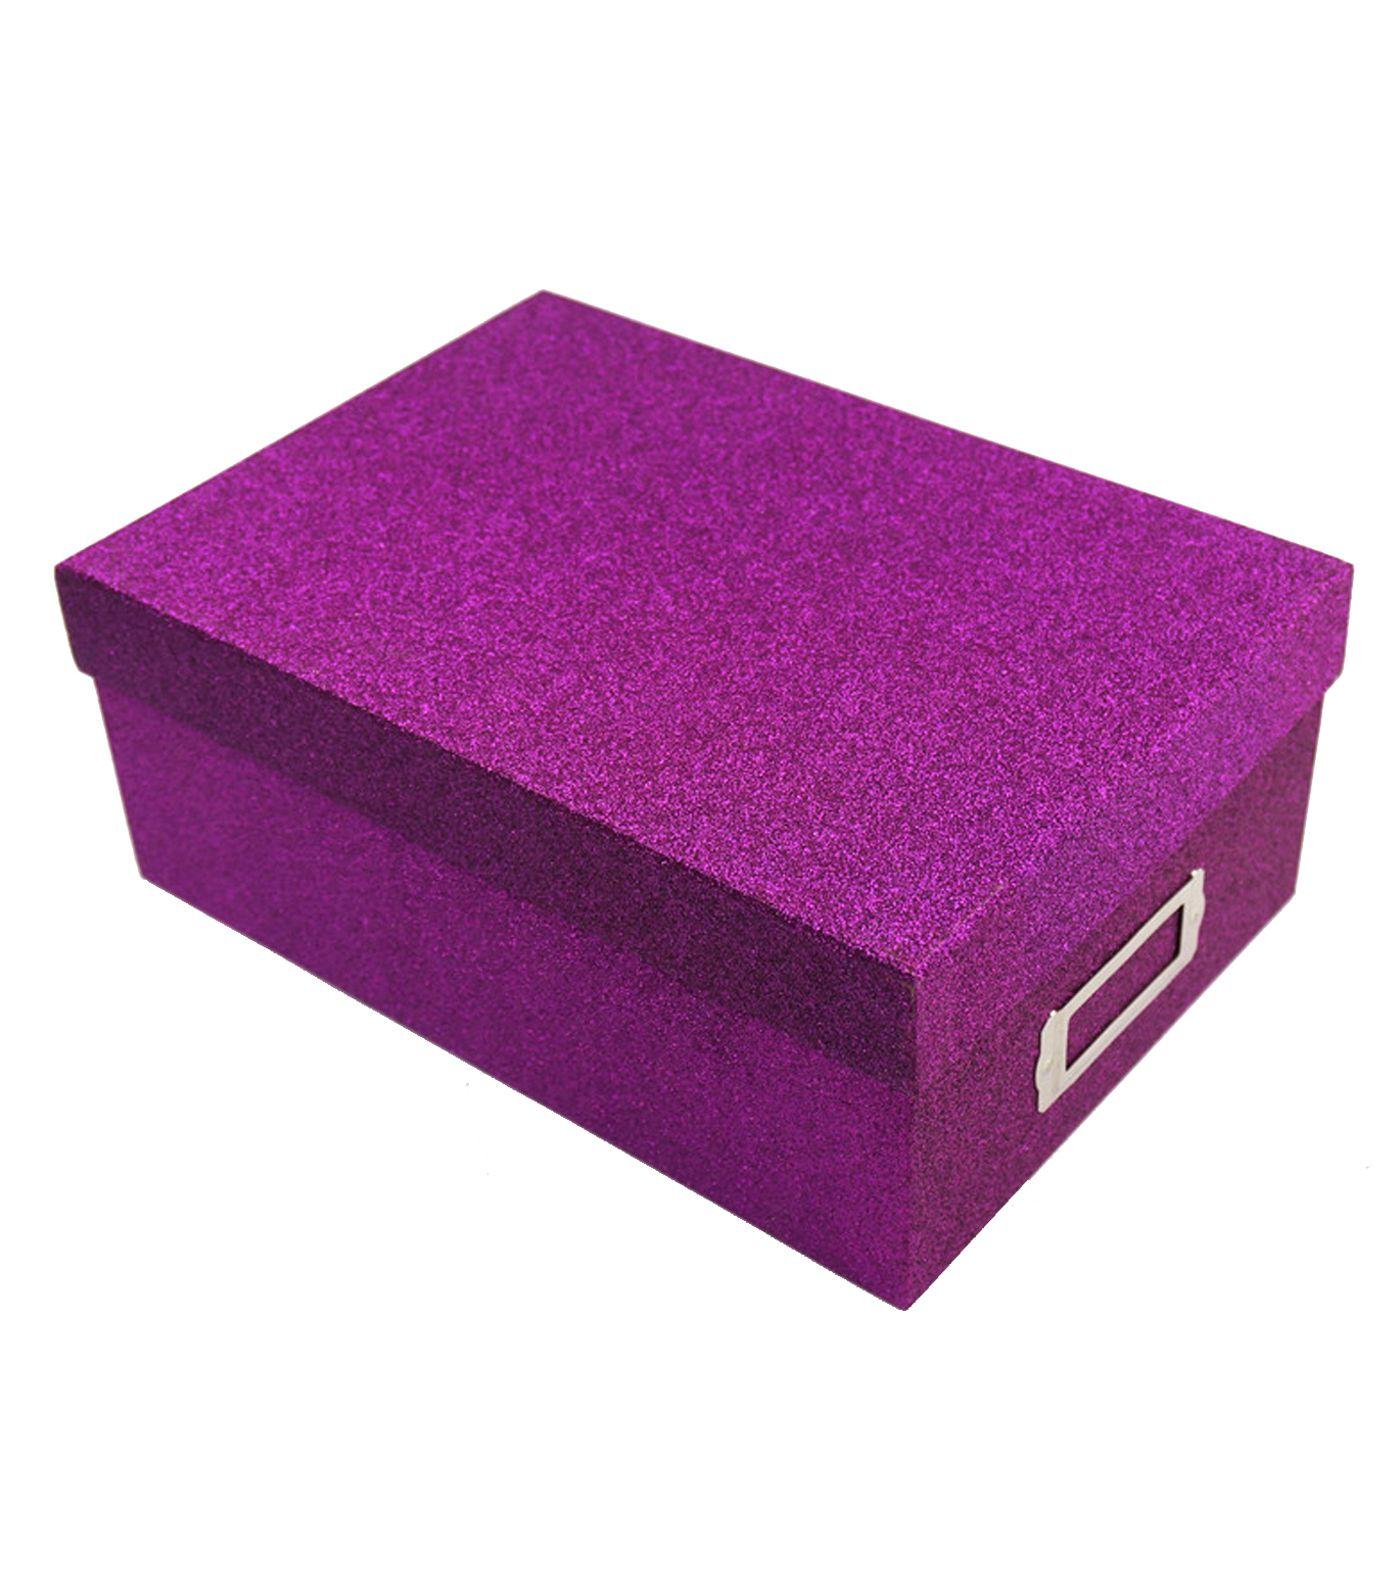 Ordinaire CRAFT BOX $4.19 Purple Glitter Photo Storage Box